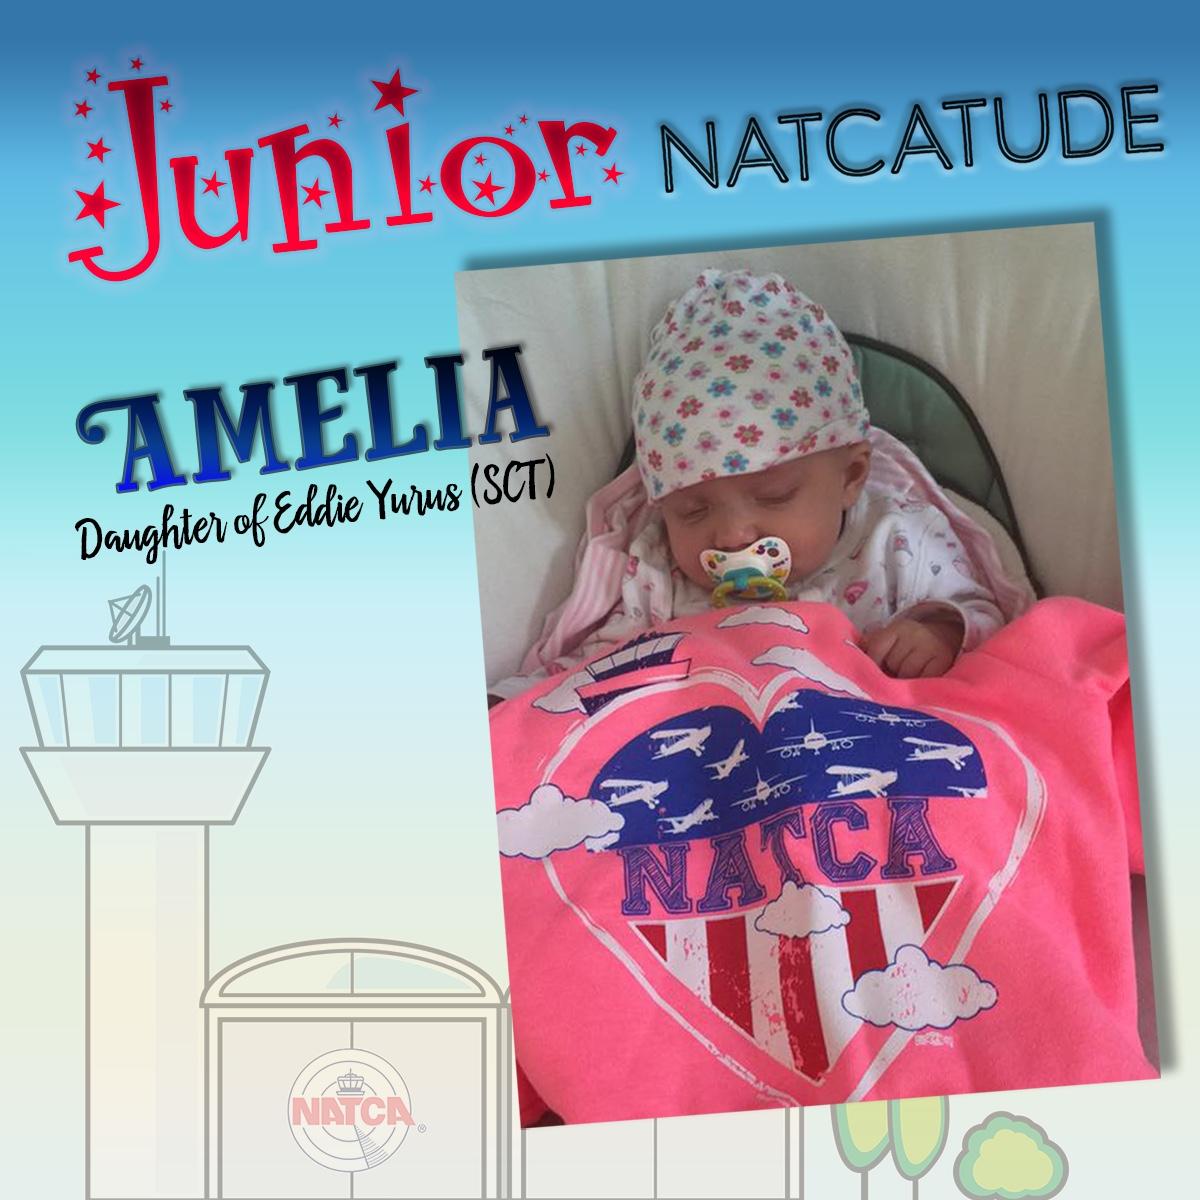 Jr Natcatude Amelia